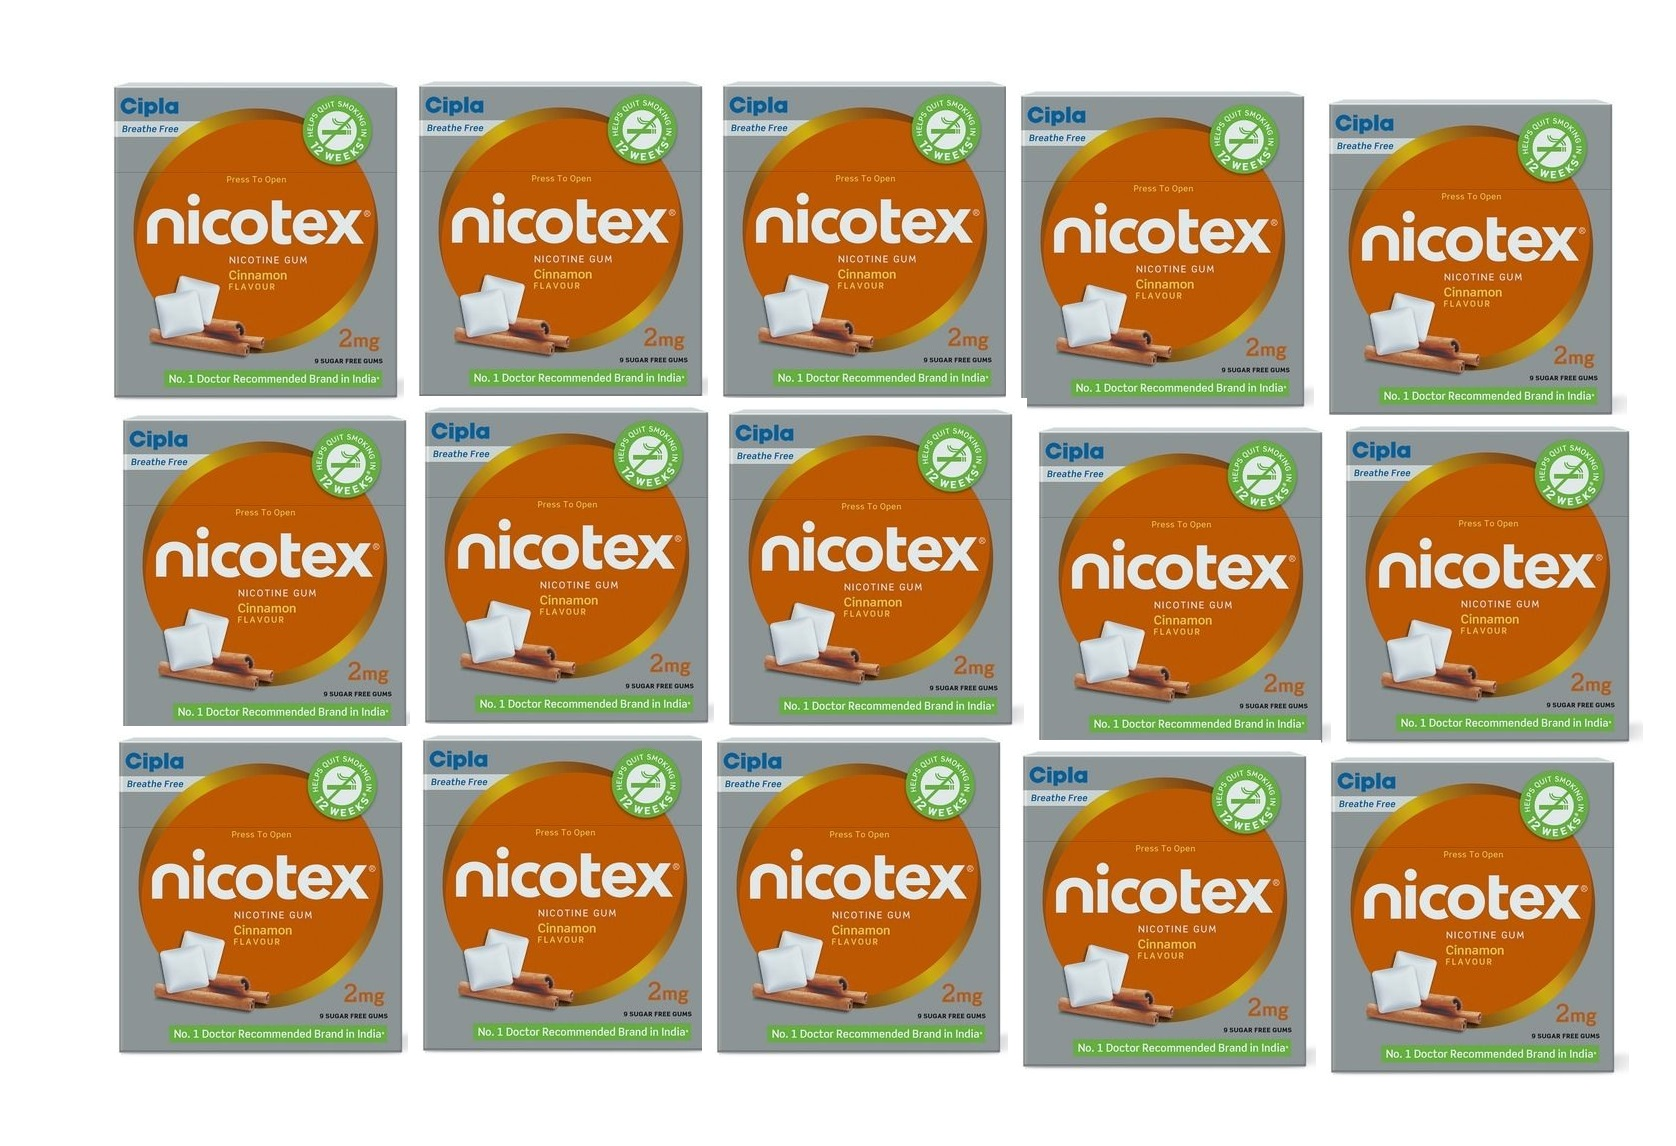 Cipla Nicotex 2mg Cinnamon Flavour Nicotine Gum Pack of 15 boxes